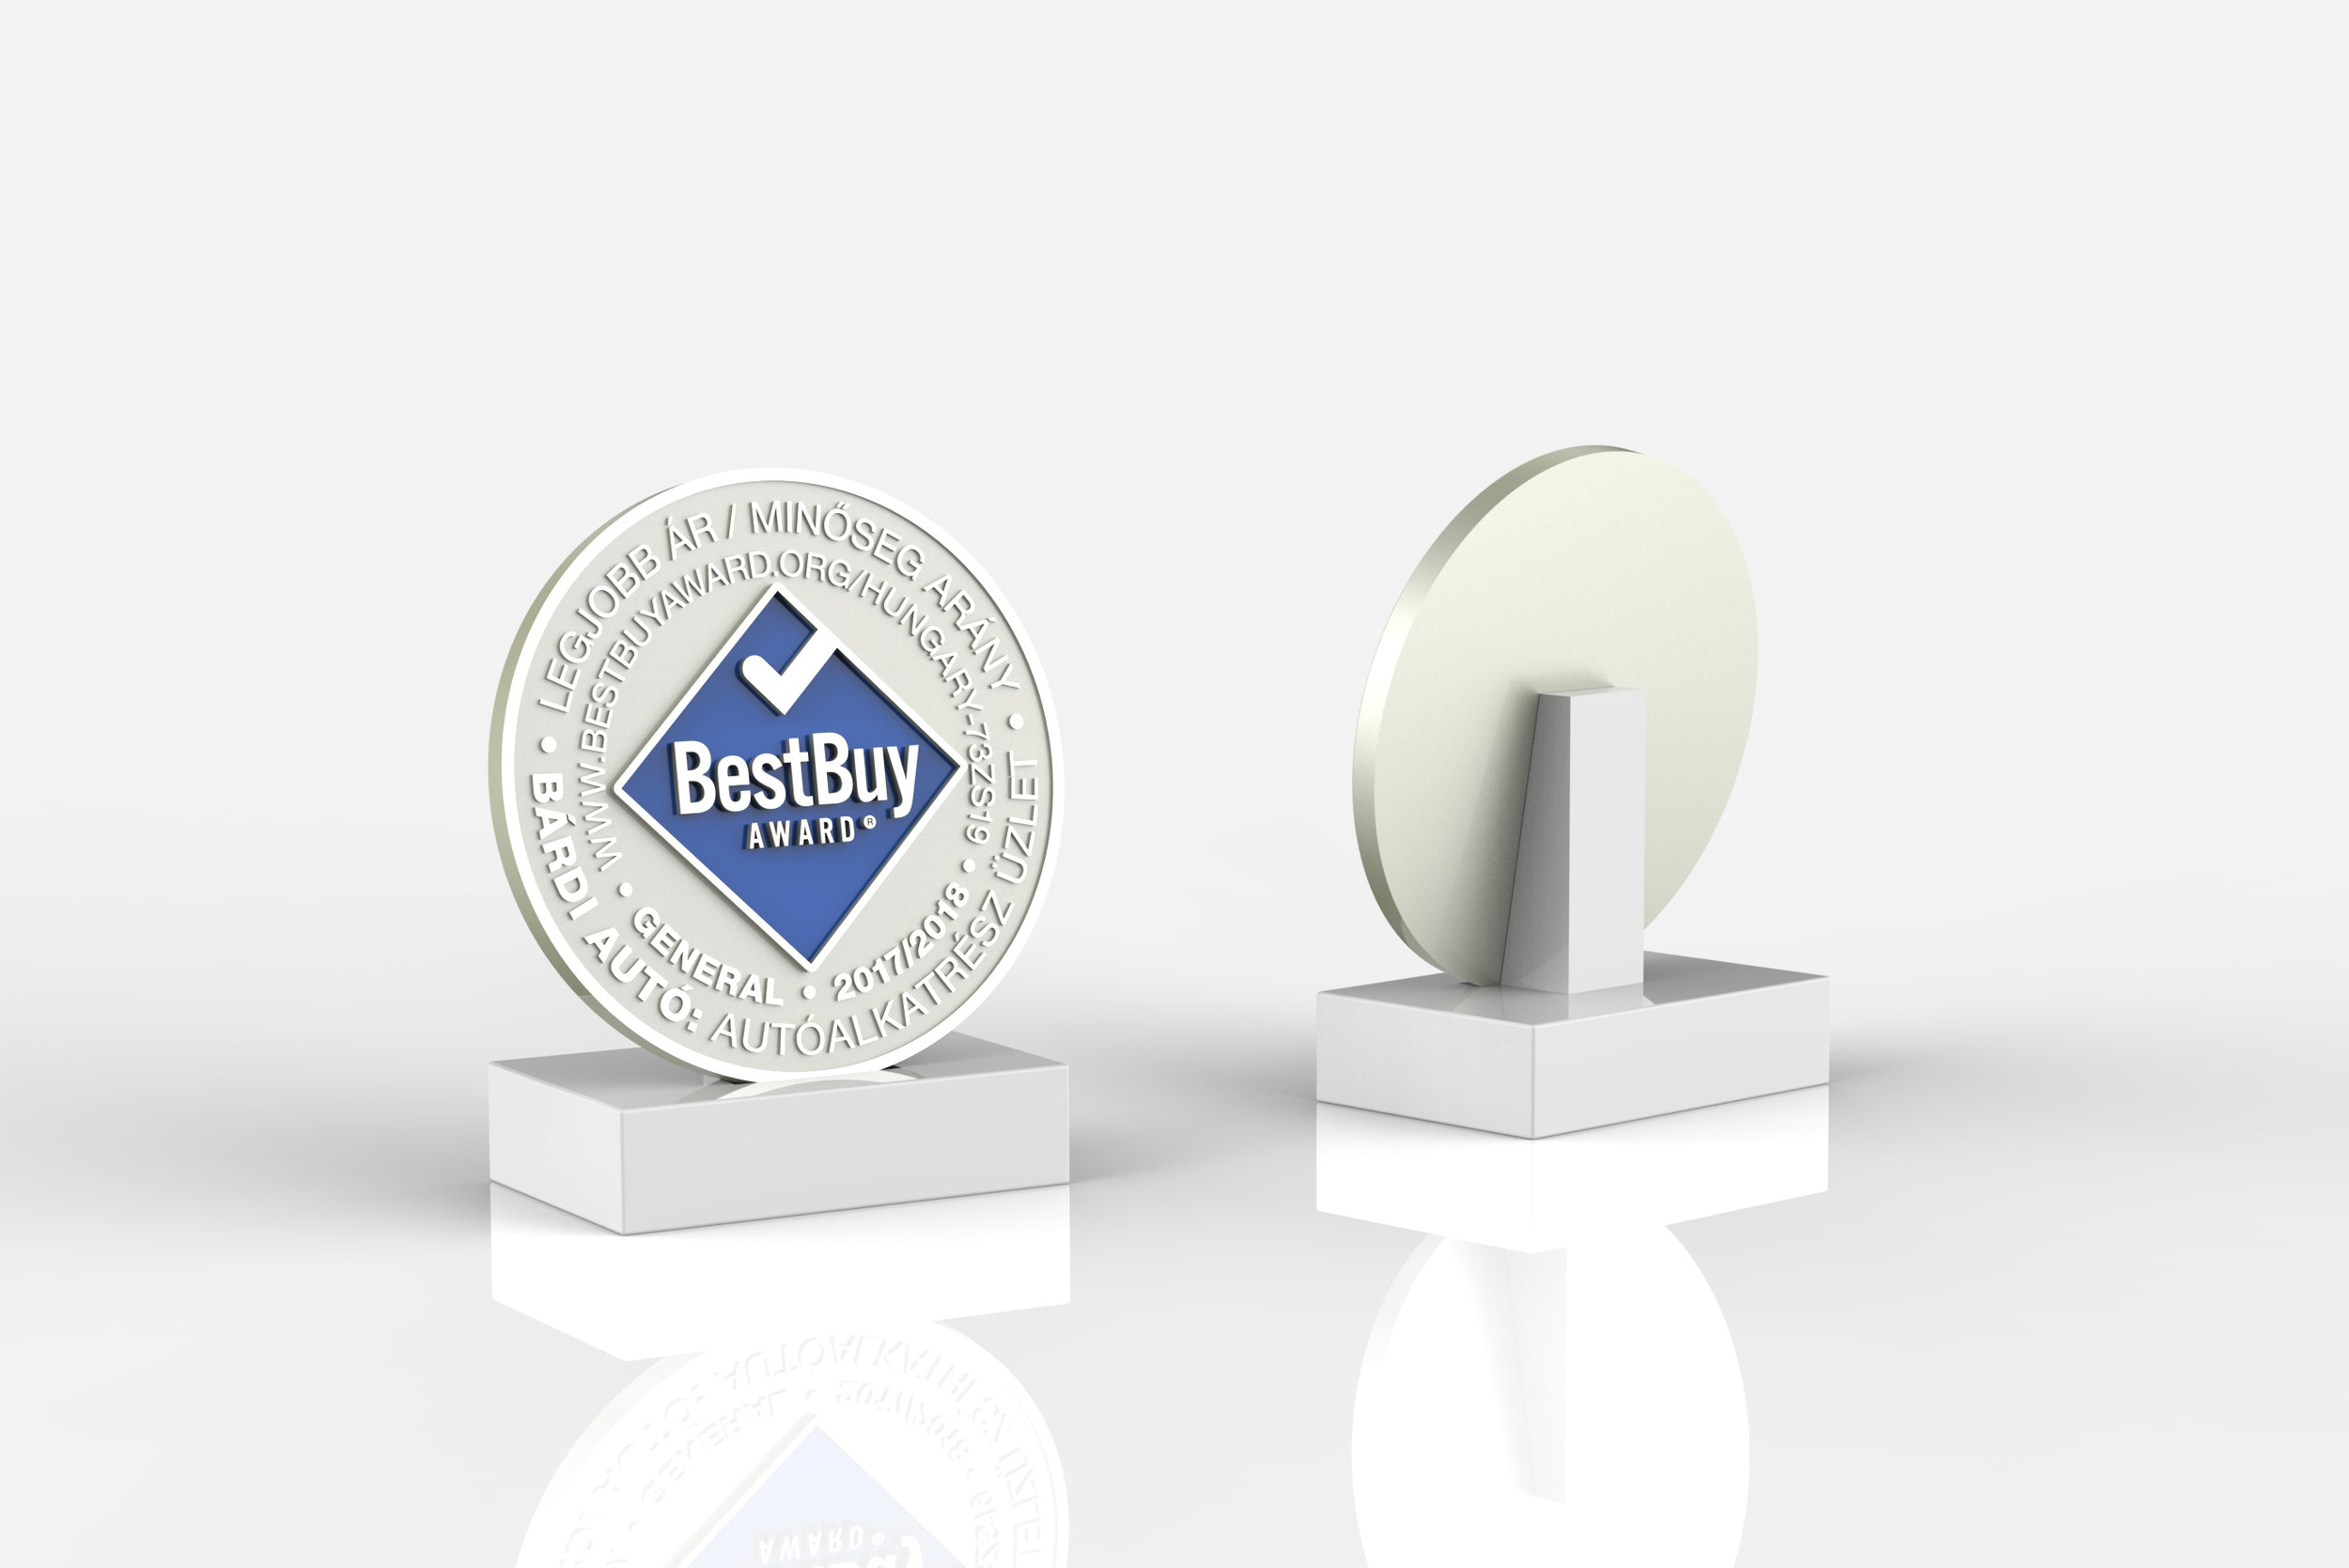 BestBuy nagrada.3028.jpg